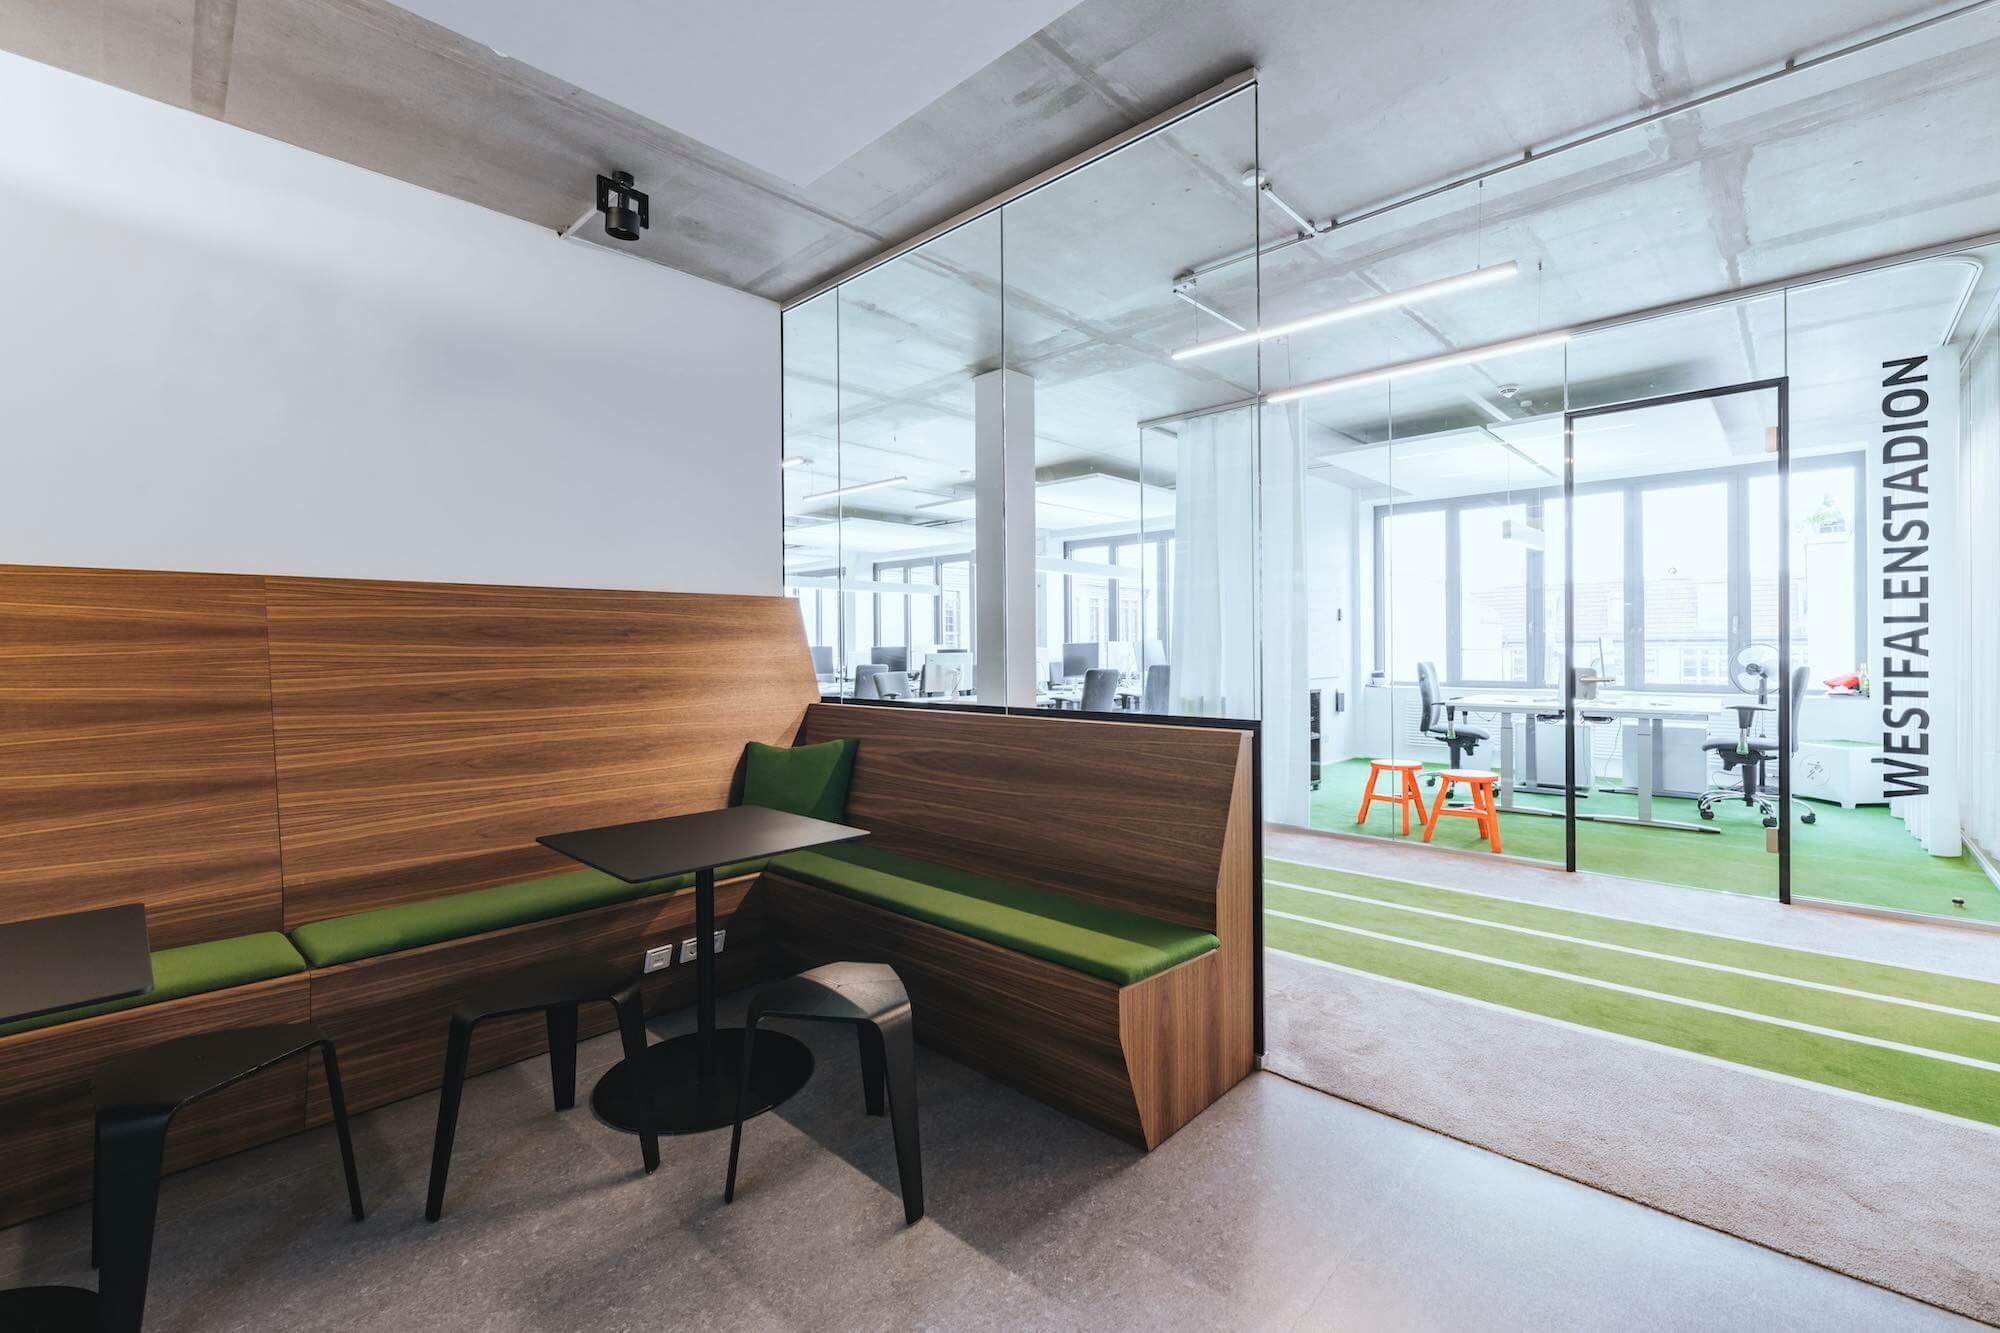 Onefootball Startup Büro TKEZ Architekten Westfalenstadion Büro